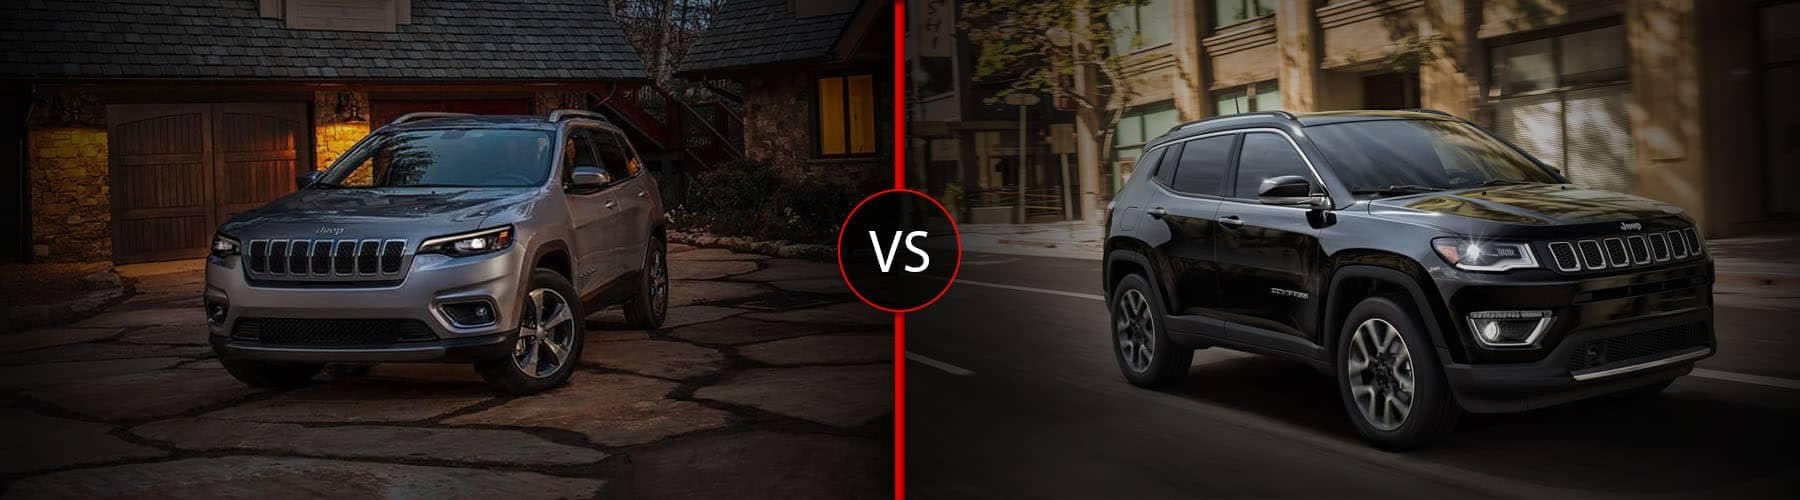 Jeep Compass Vs Jeep Cherokee >> 2019 Jeep Cherokee Vs 2018 Jeep Compass Don Johnson Motors